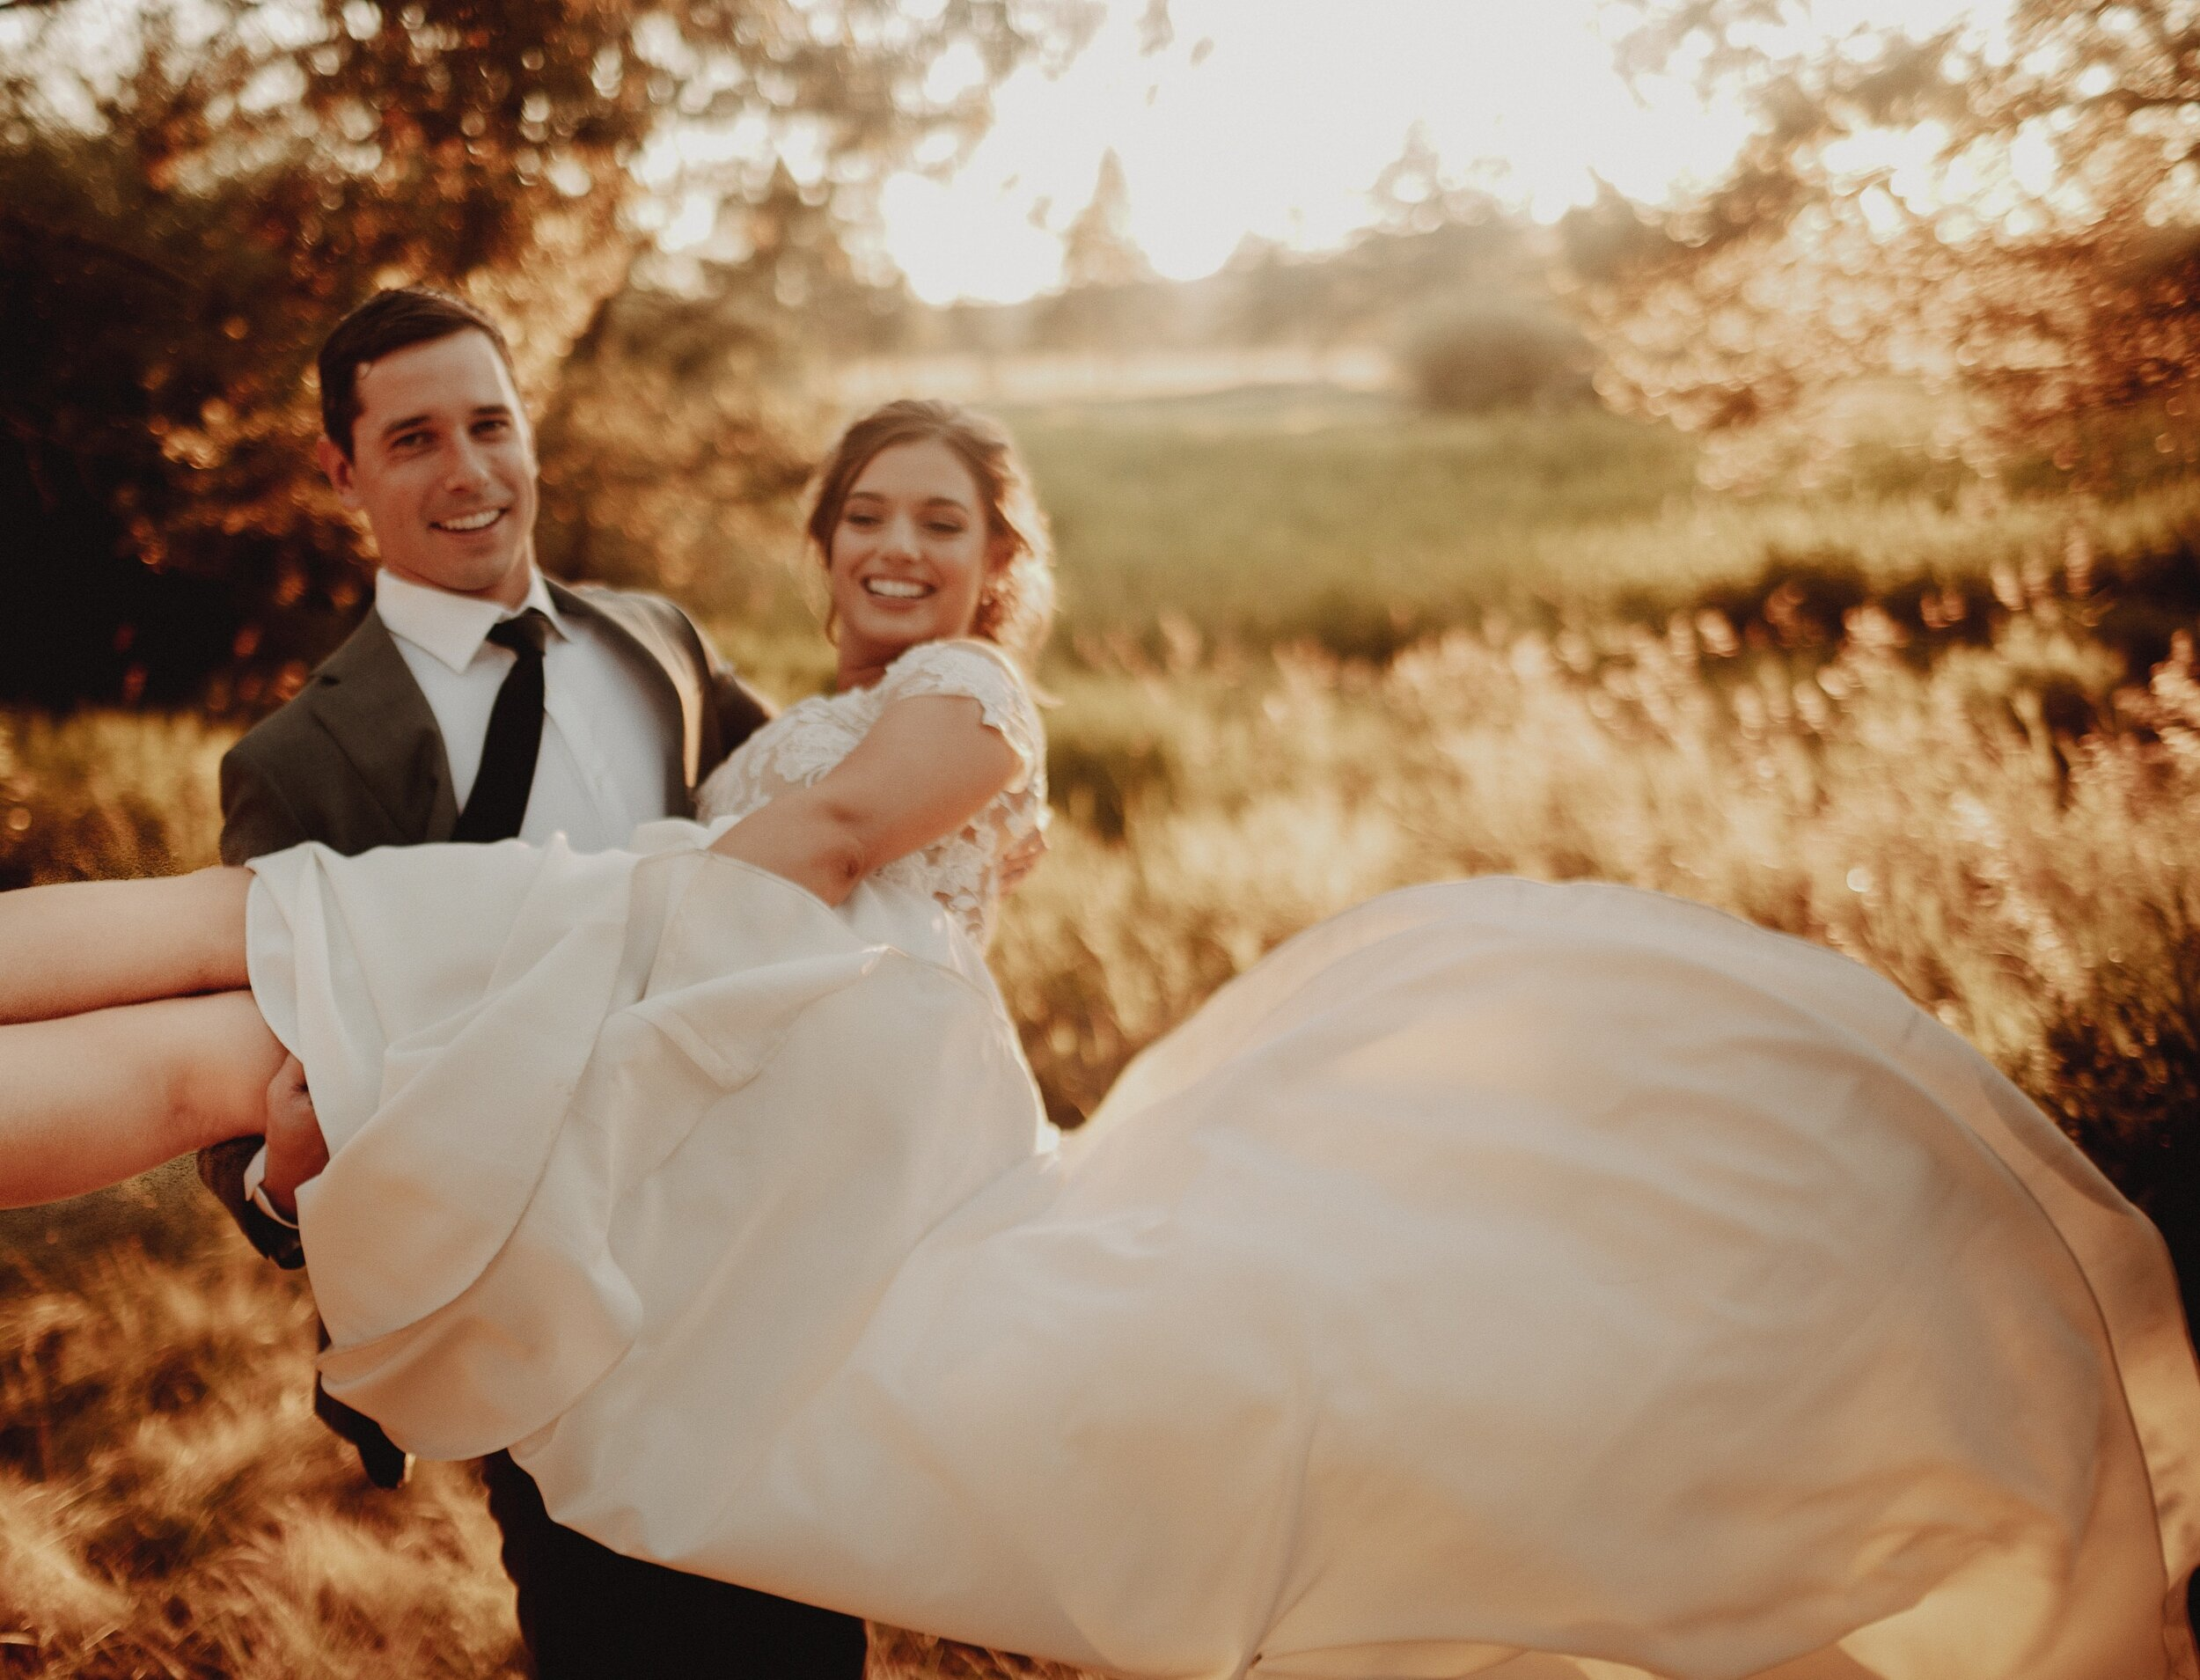 J and M Wed in Sunriver.Lauren Apel Photo1027.jpg